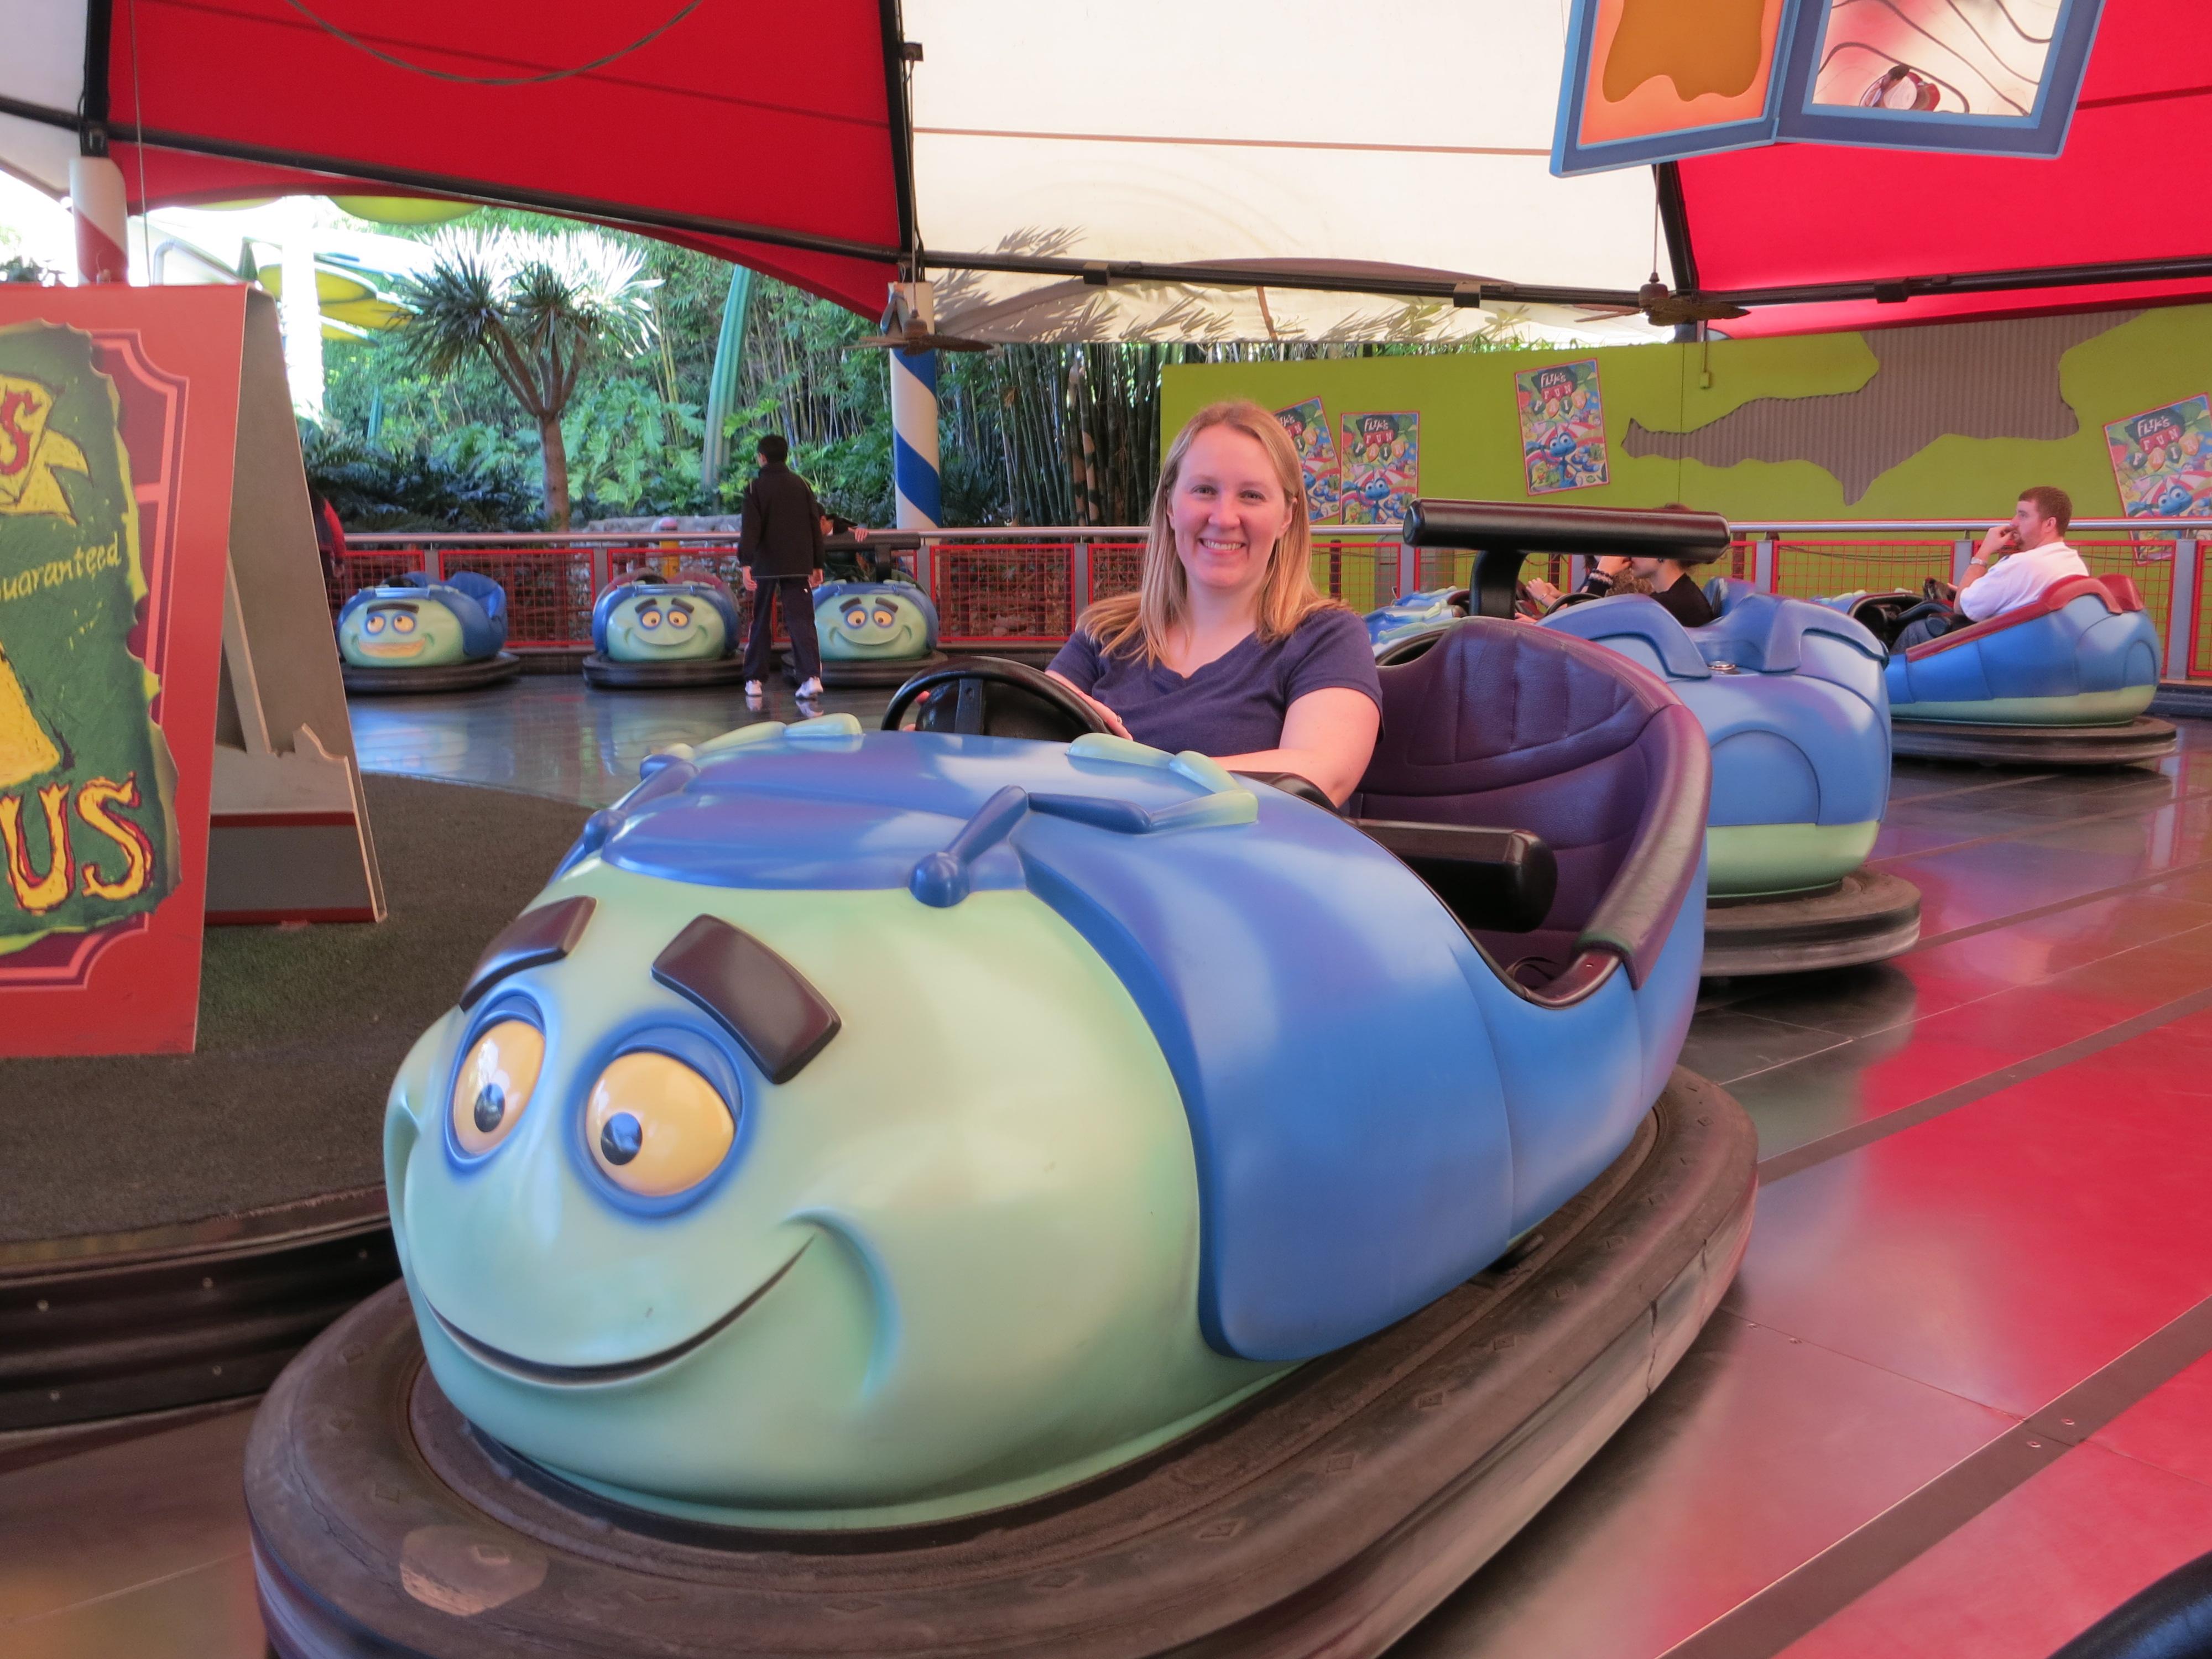 Bug's land bumper cars: Top 7 Attractions in Disneyland's California Adventure for Toddlers & Preschoolers